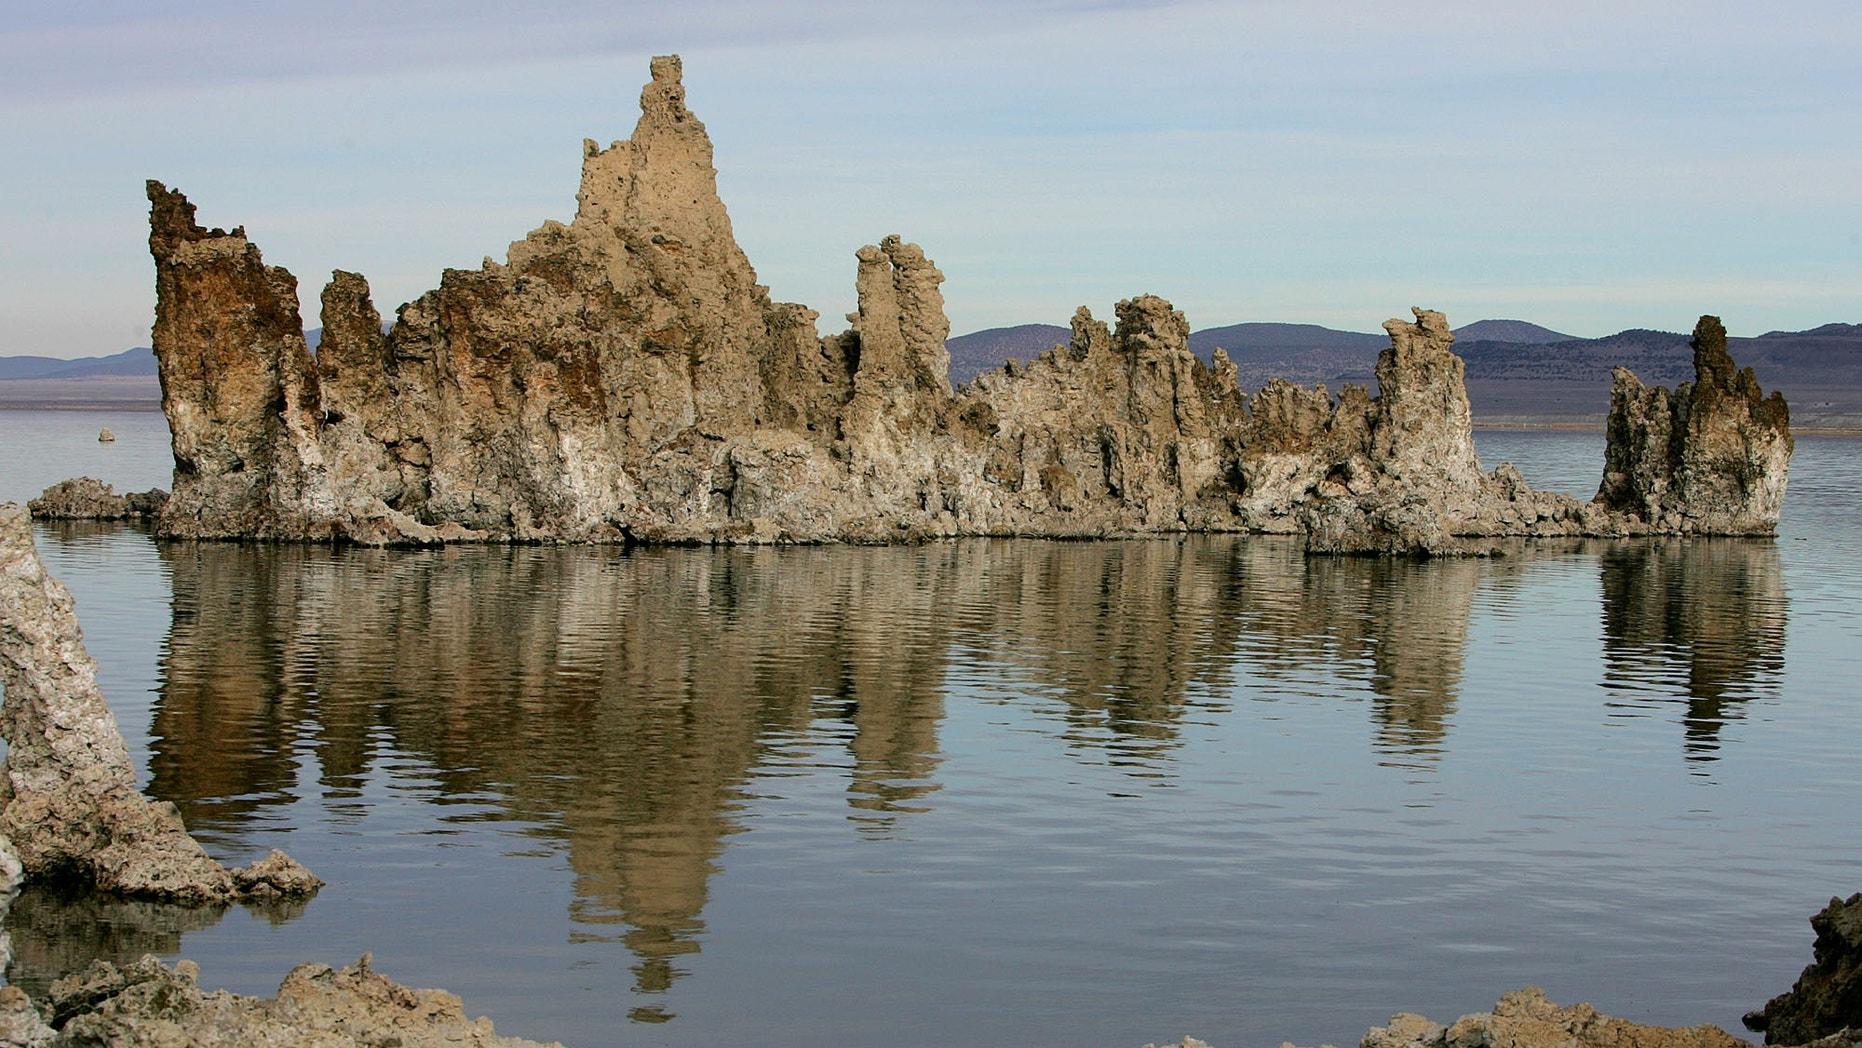 FILE: This photo shows tufa towers in Mono Lake near Lee Vining, Calif.